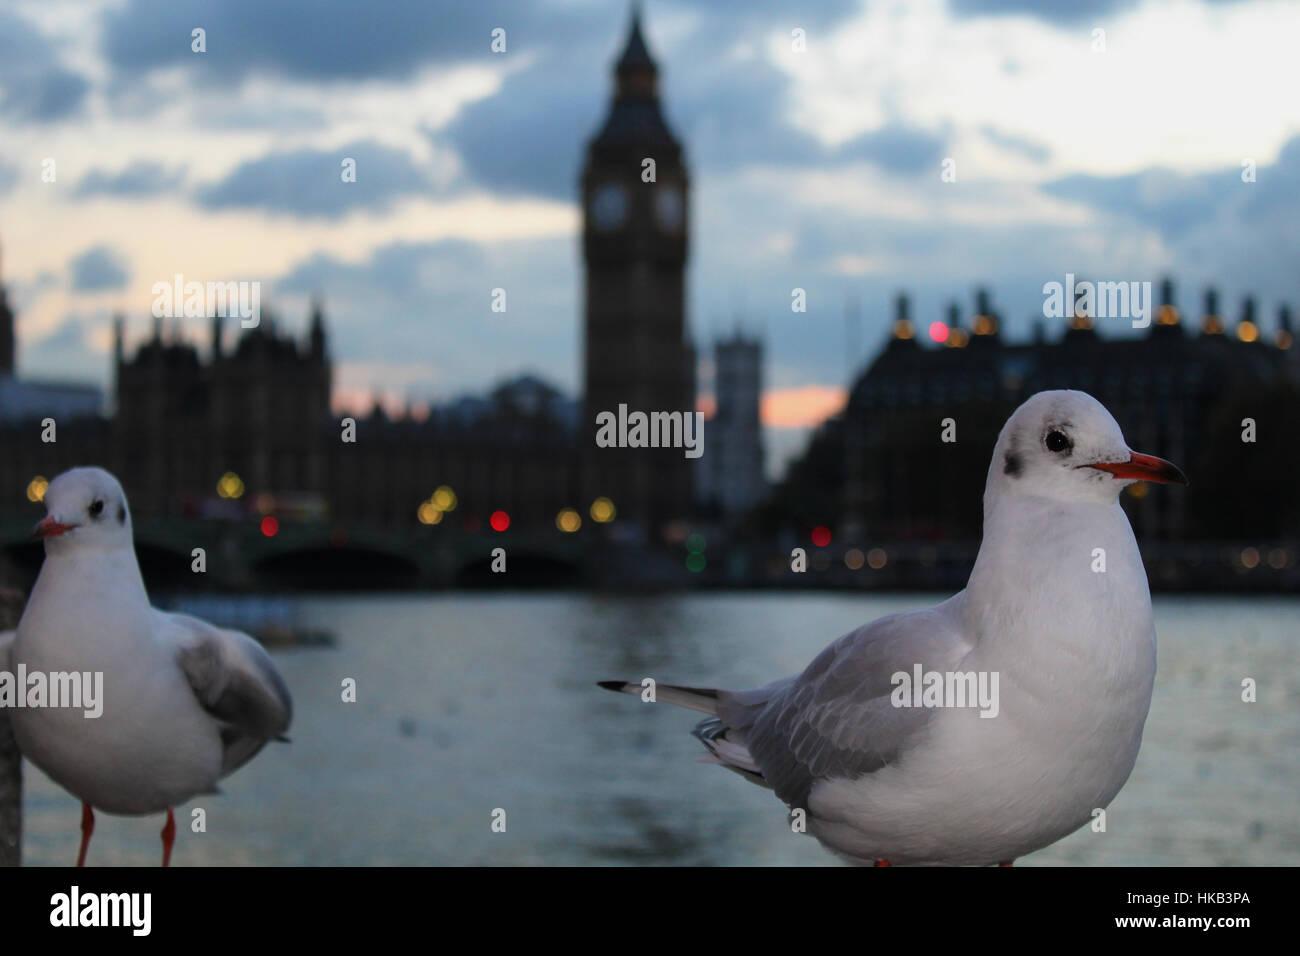 South Bank Birds - Stock Image